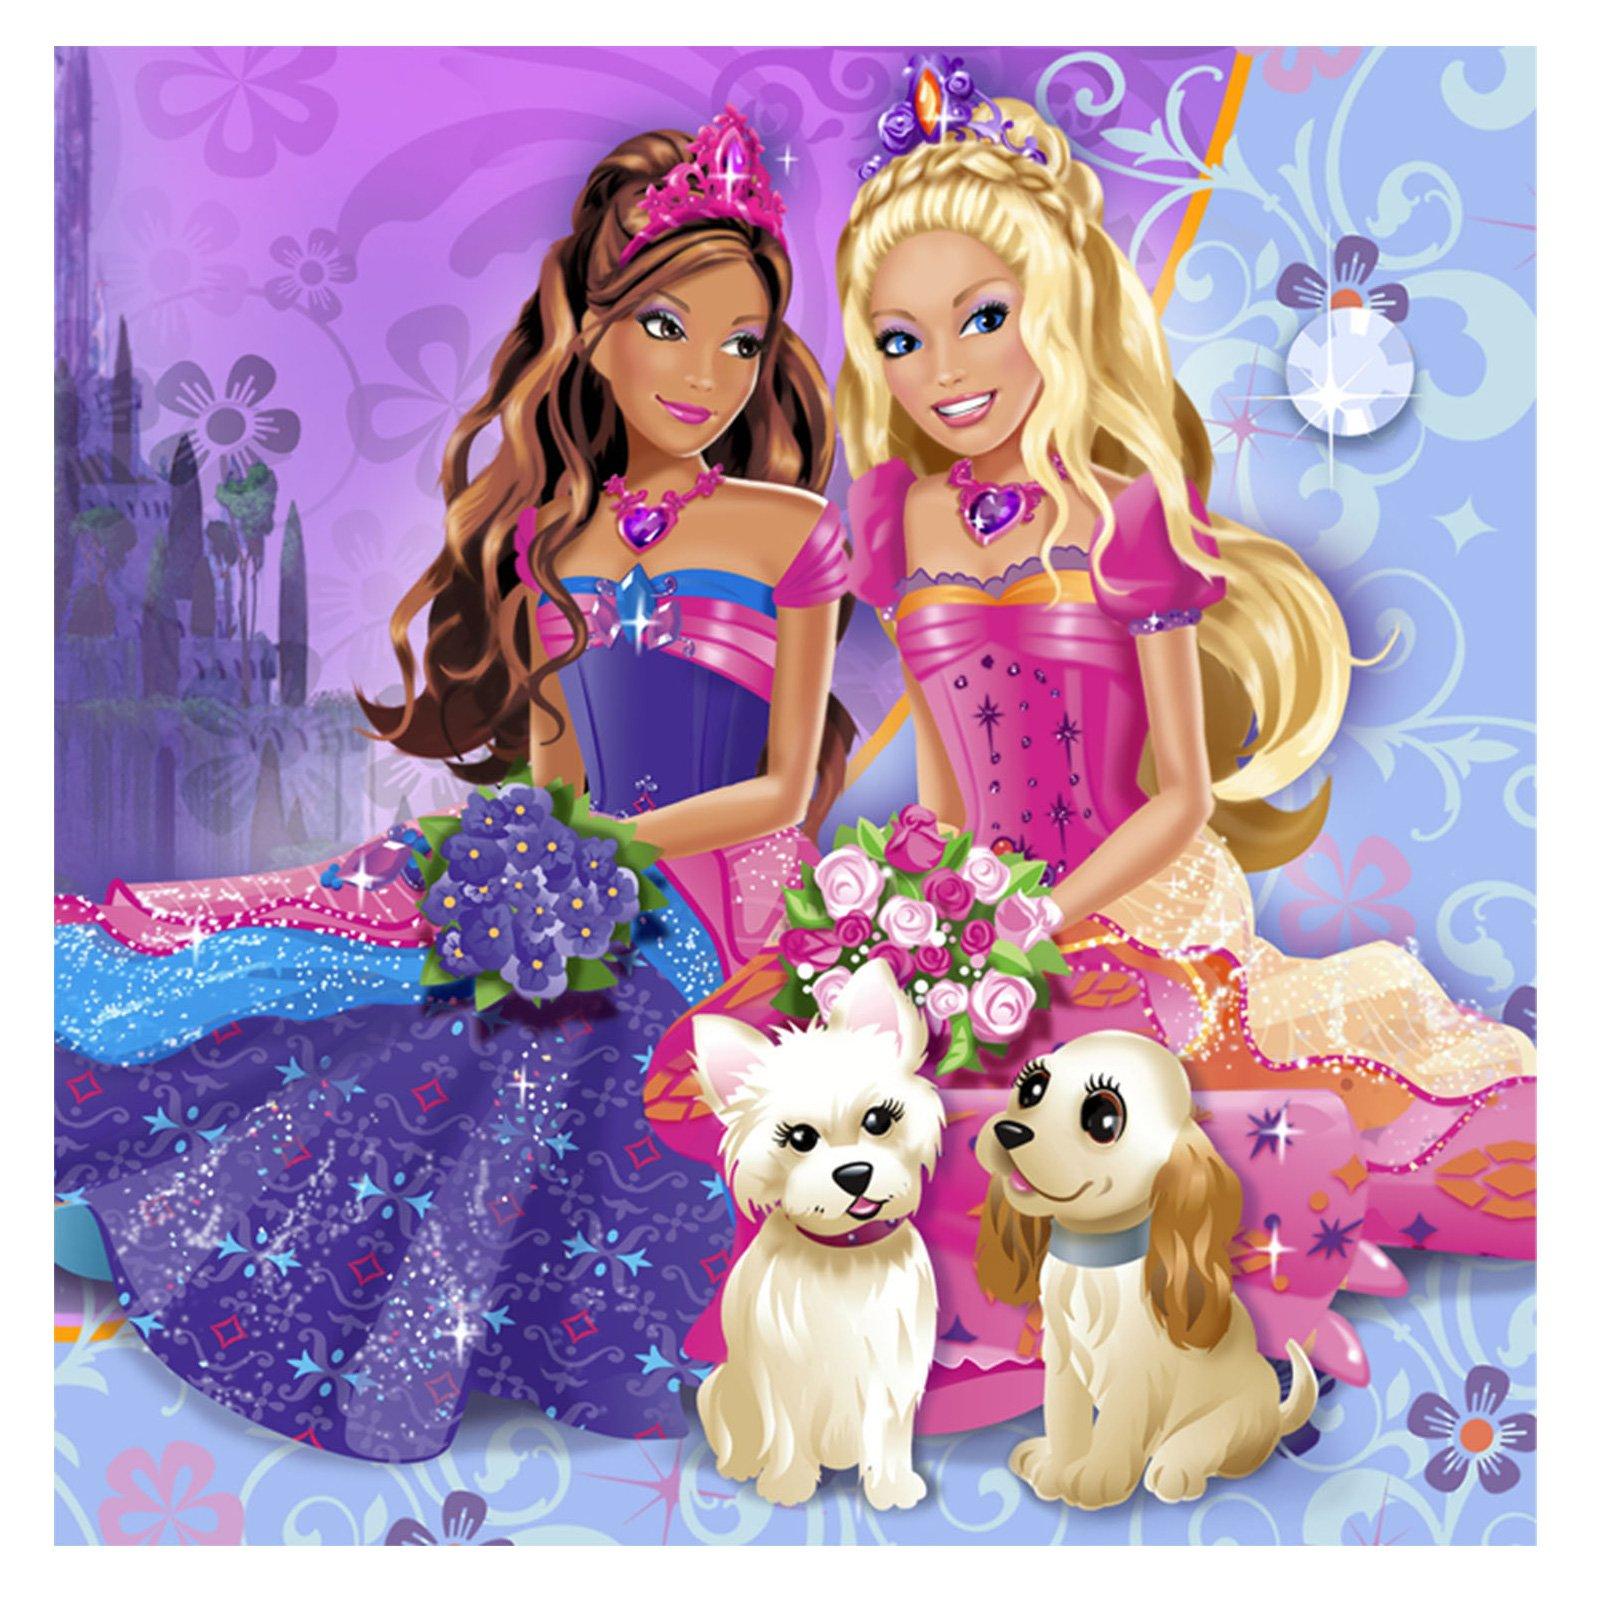 Download Wallpaper Butterfly Barbie - 9nA3G6  Gallery_361213.jpg